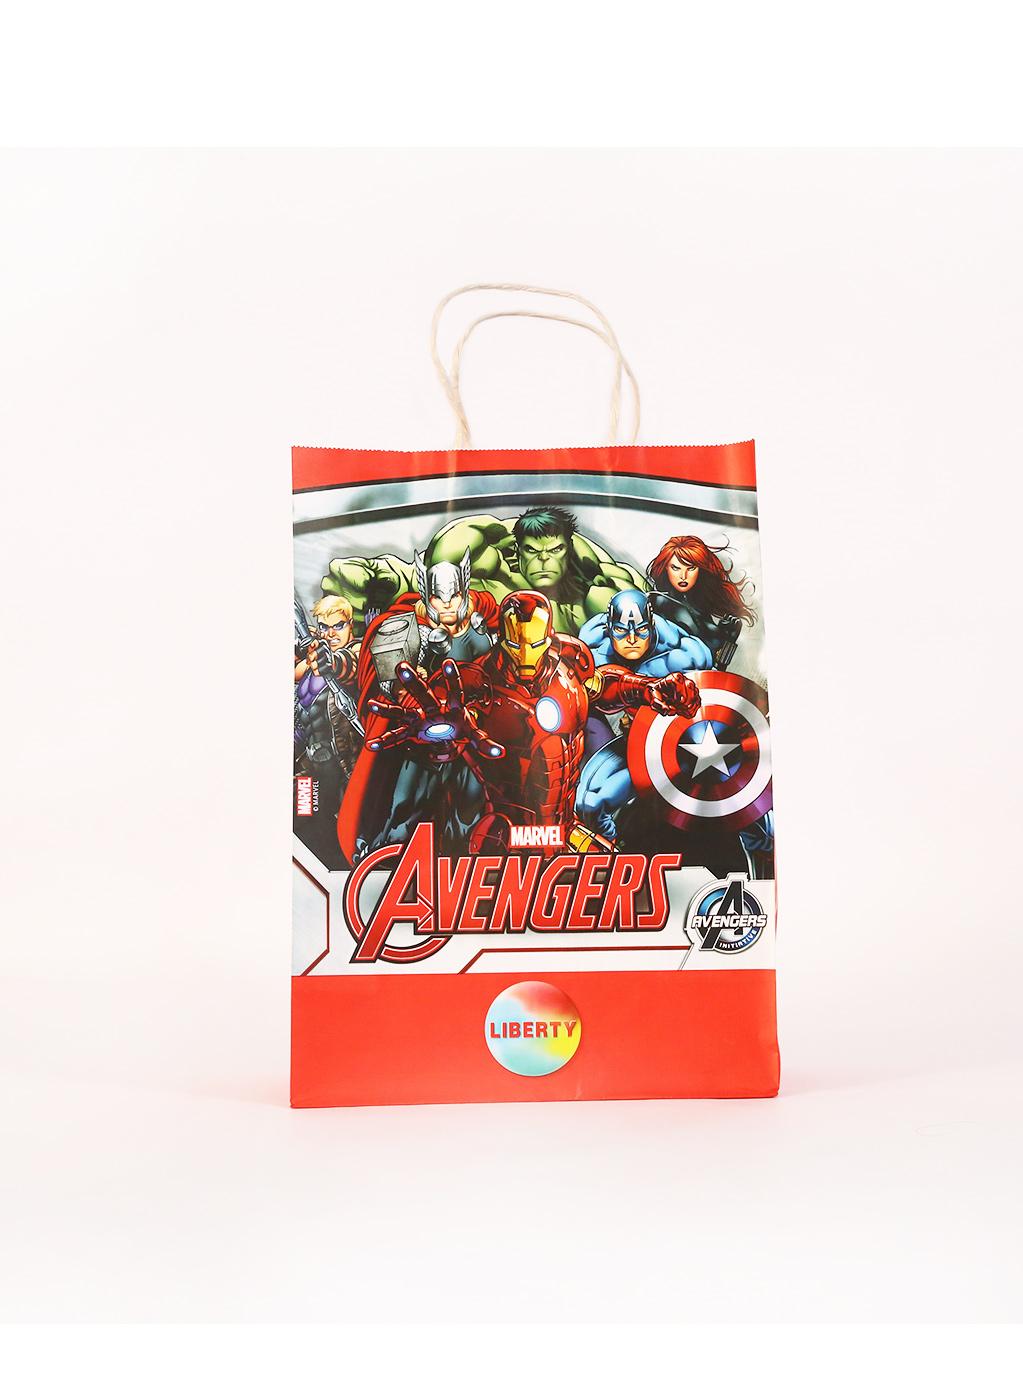 Avengers Liberty